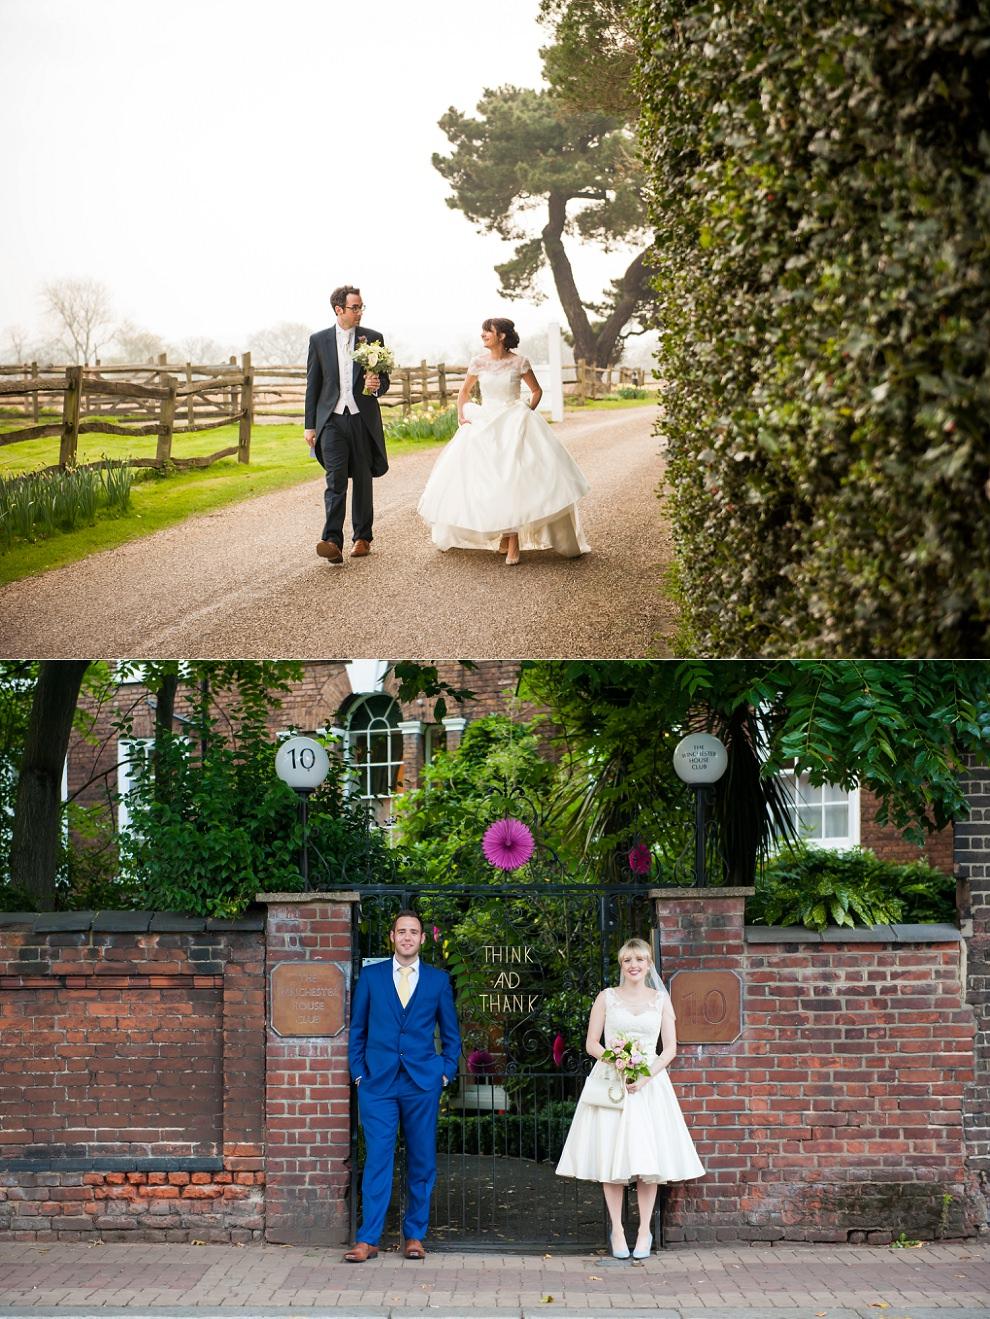 Best-wedding-photos-UK-2015-124